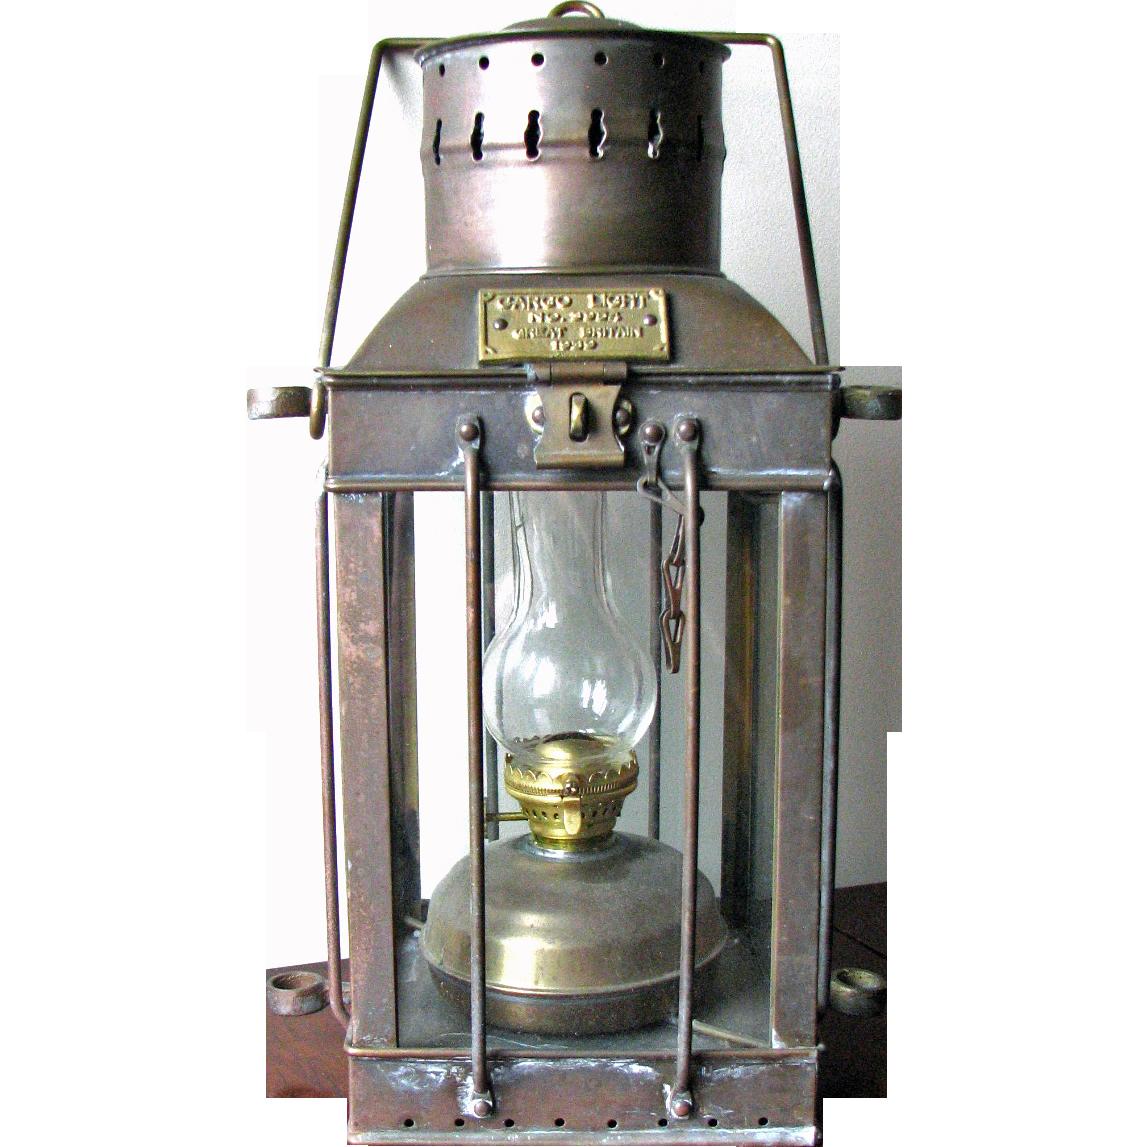 Vintage English Ship Lantern Cargo Light 1939 From